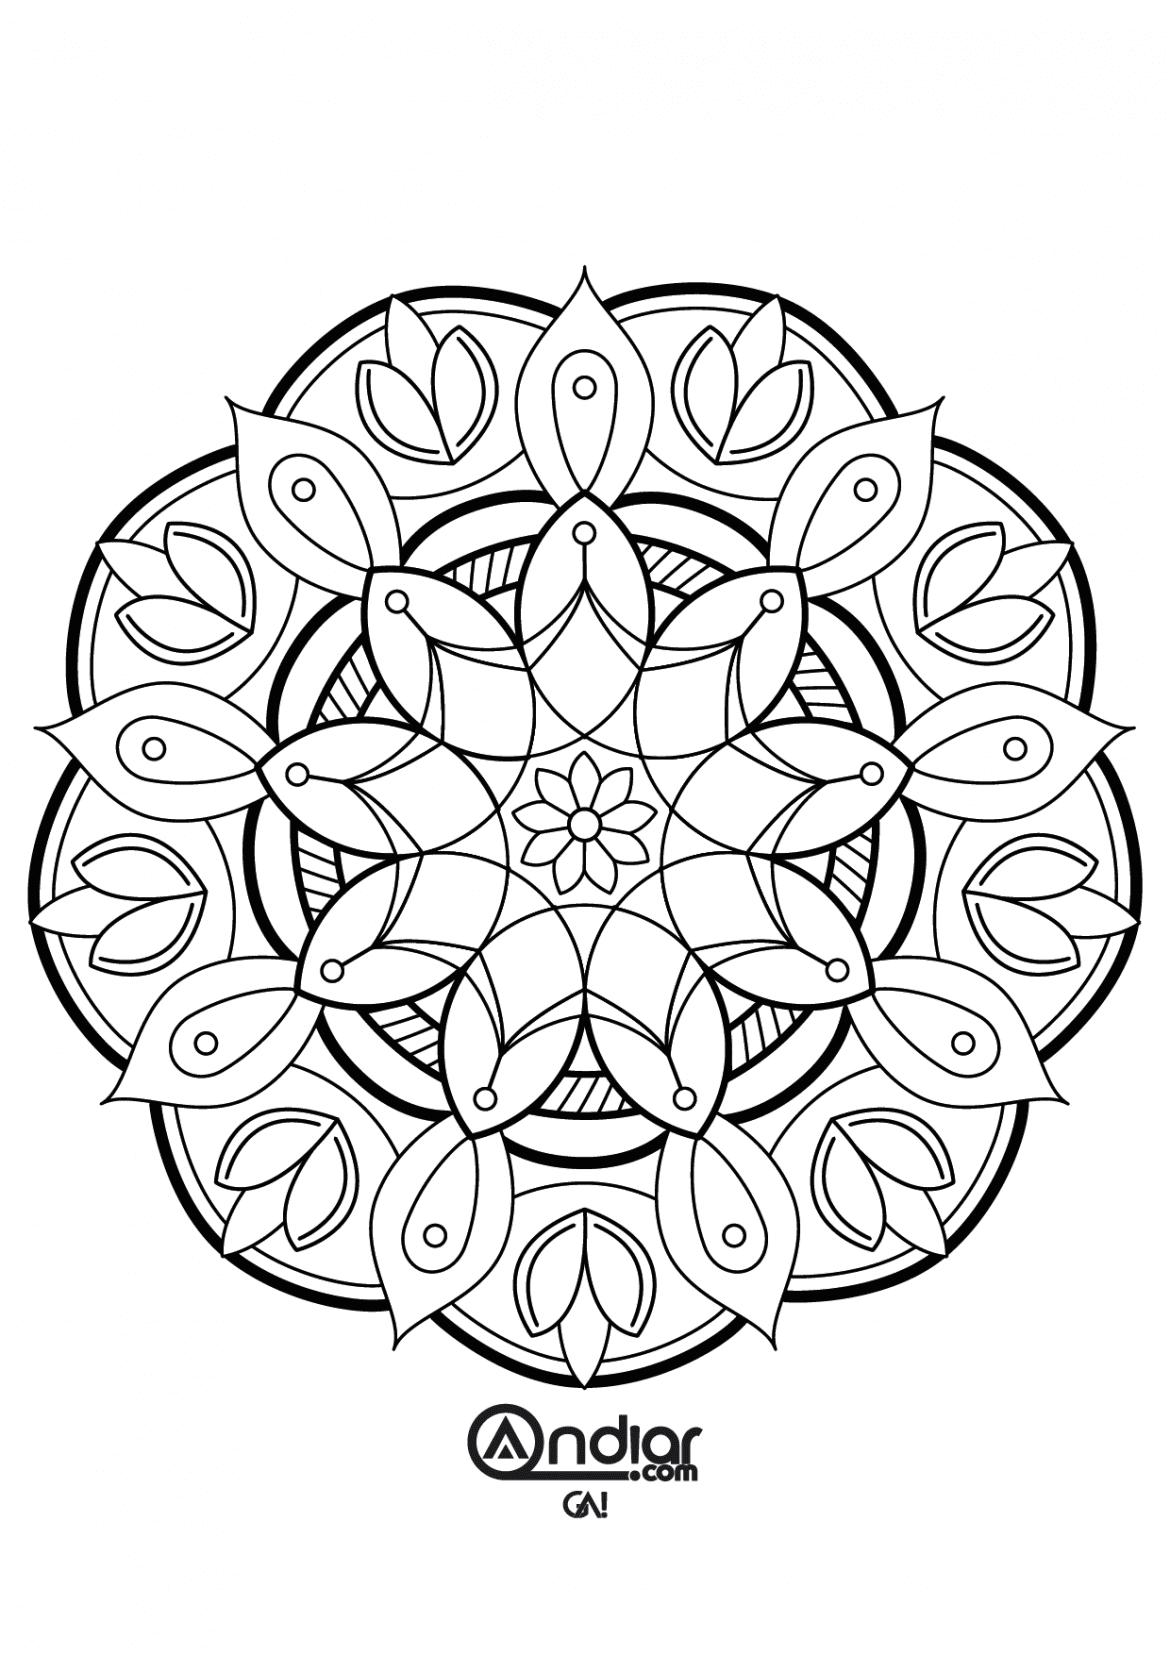 Dibujos para imprimir de mandalas, masquelibros